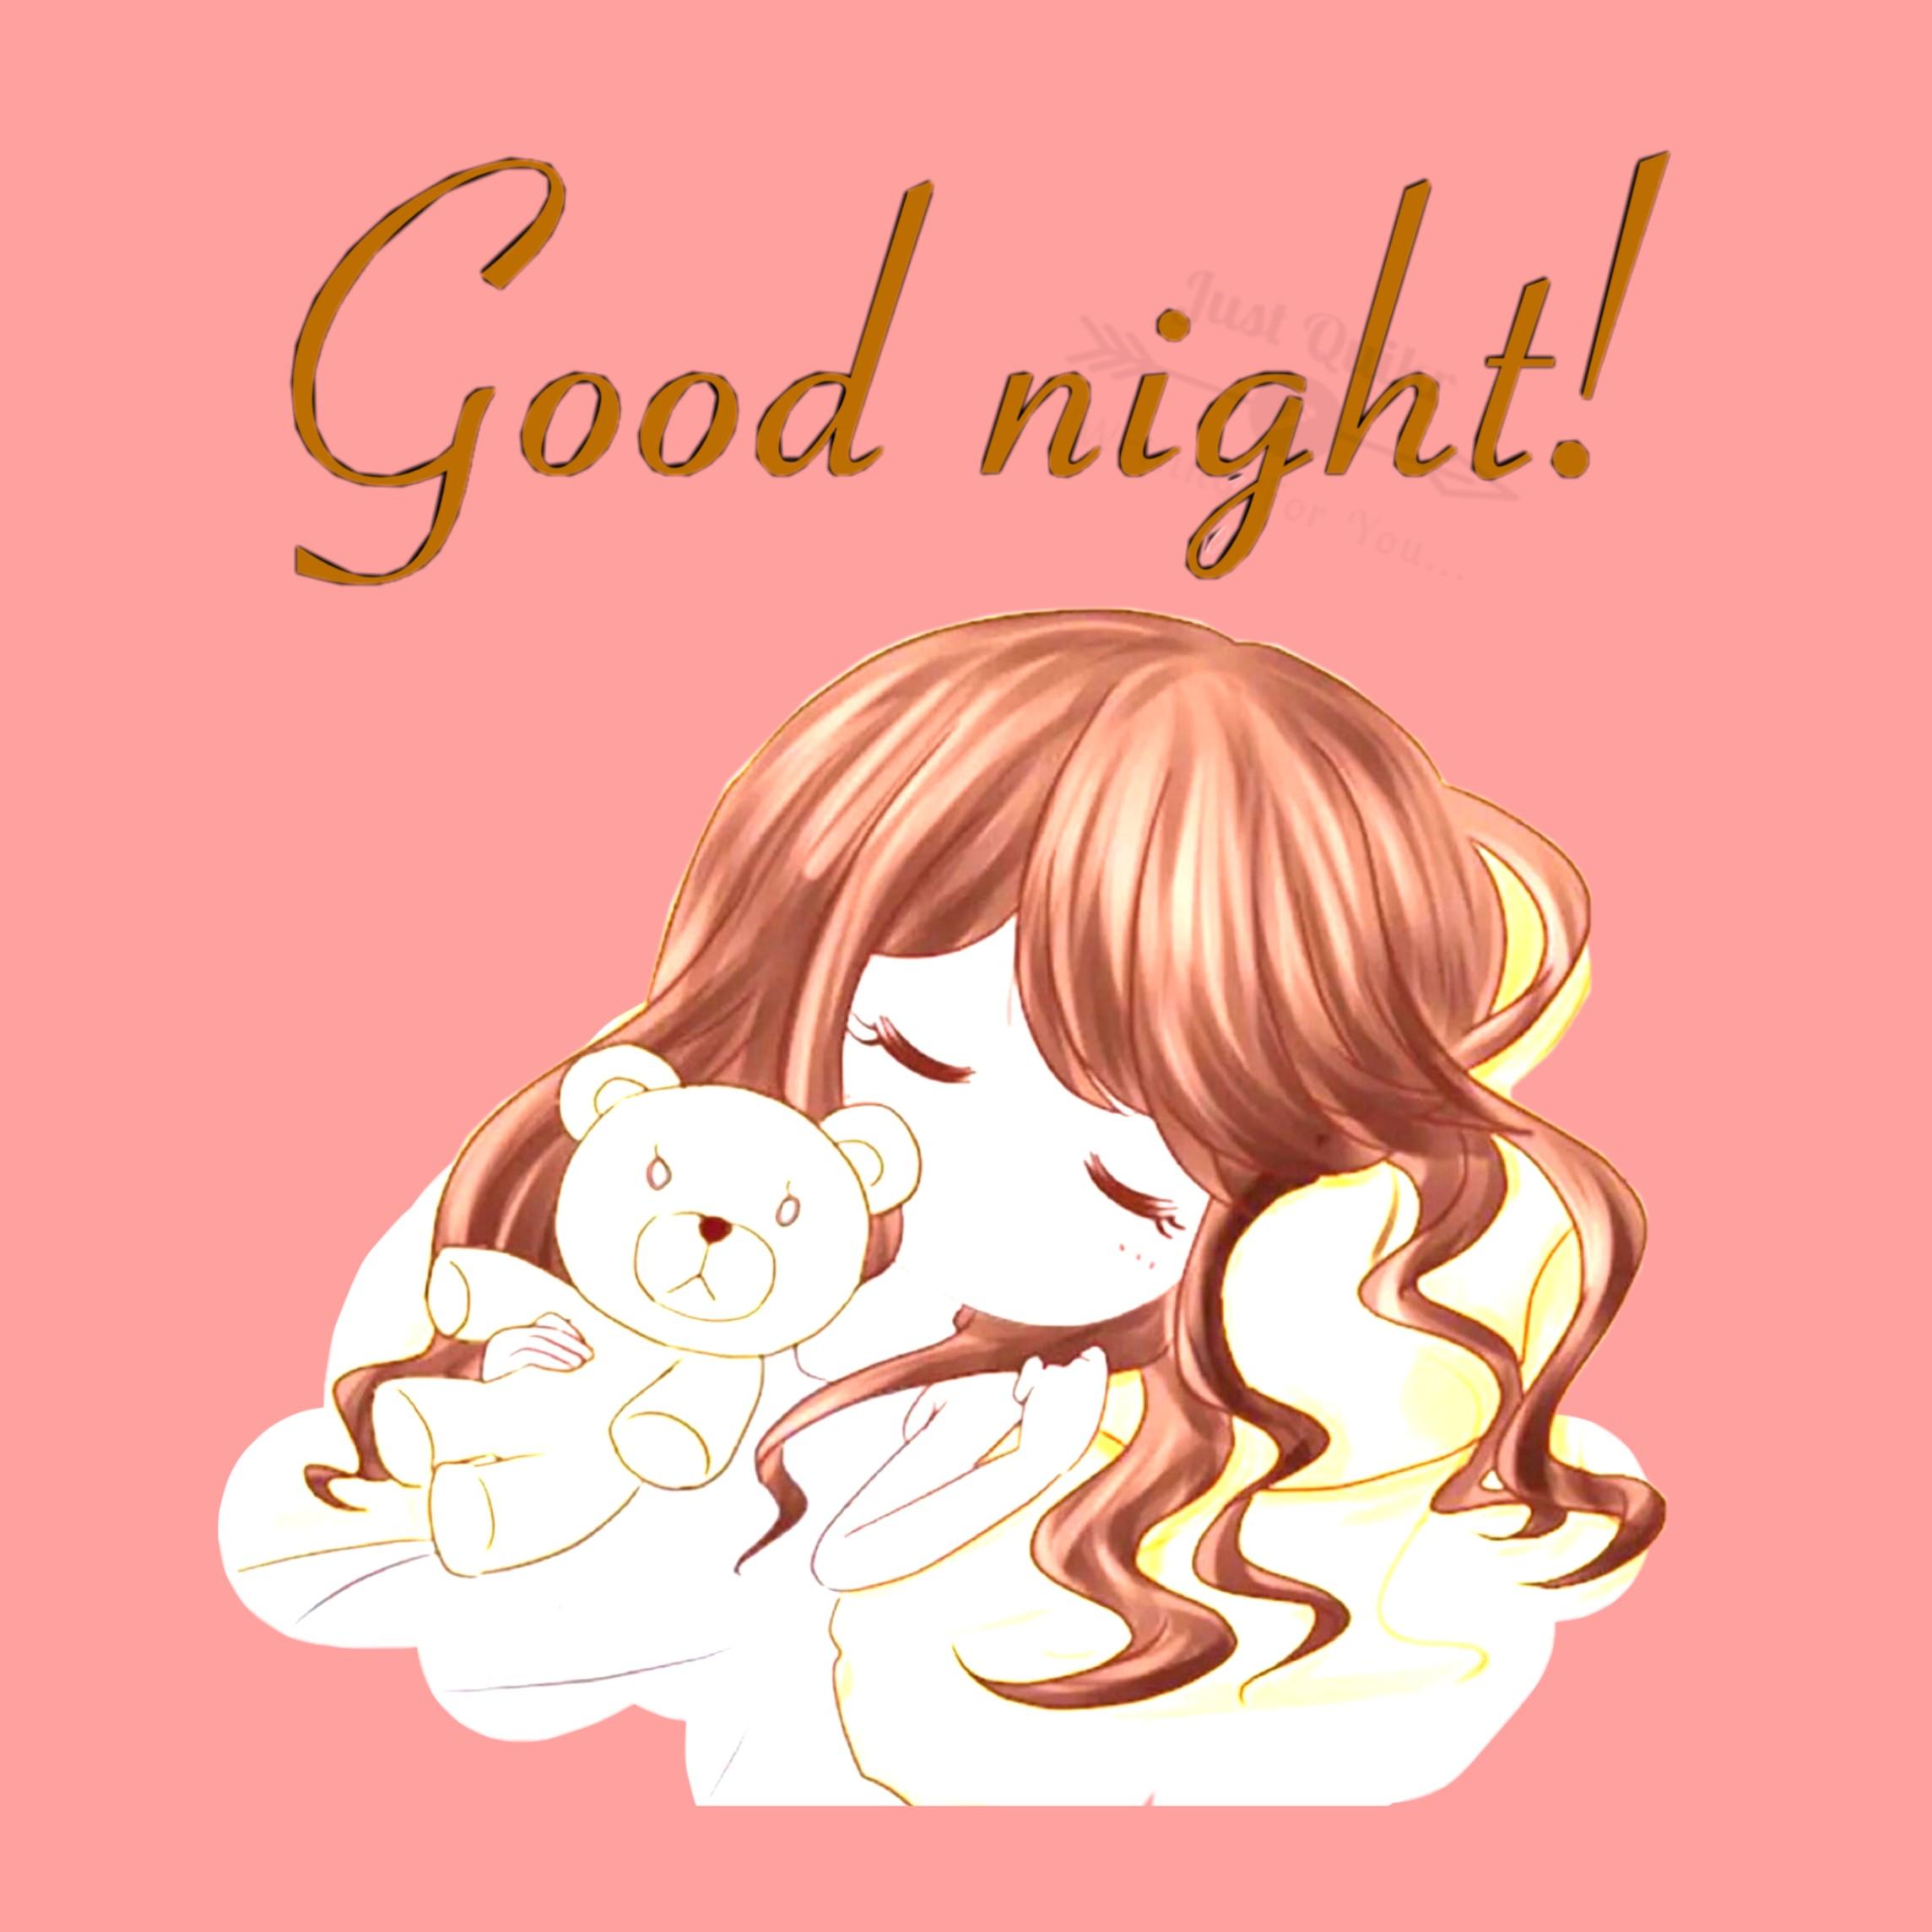 Good Night HD Pics Images For Princess